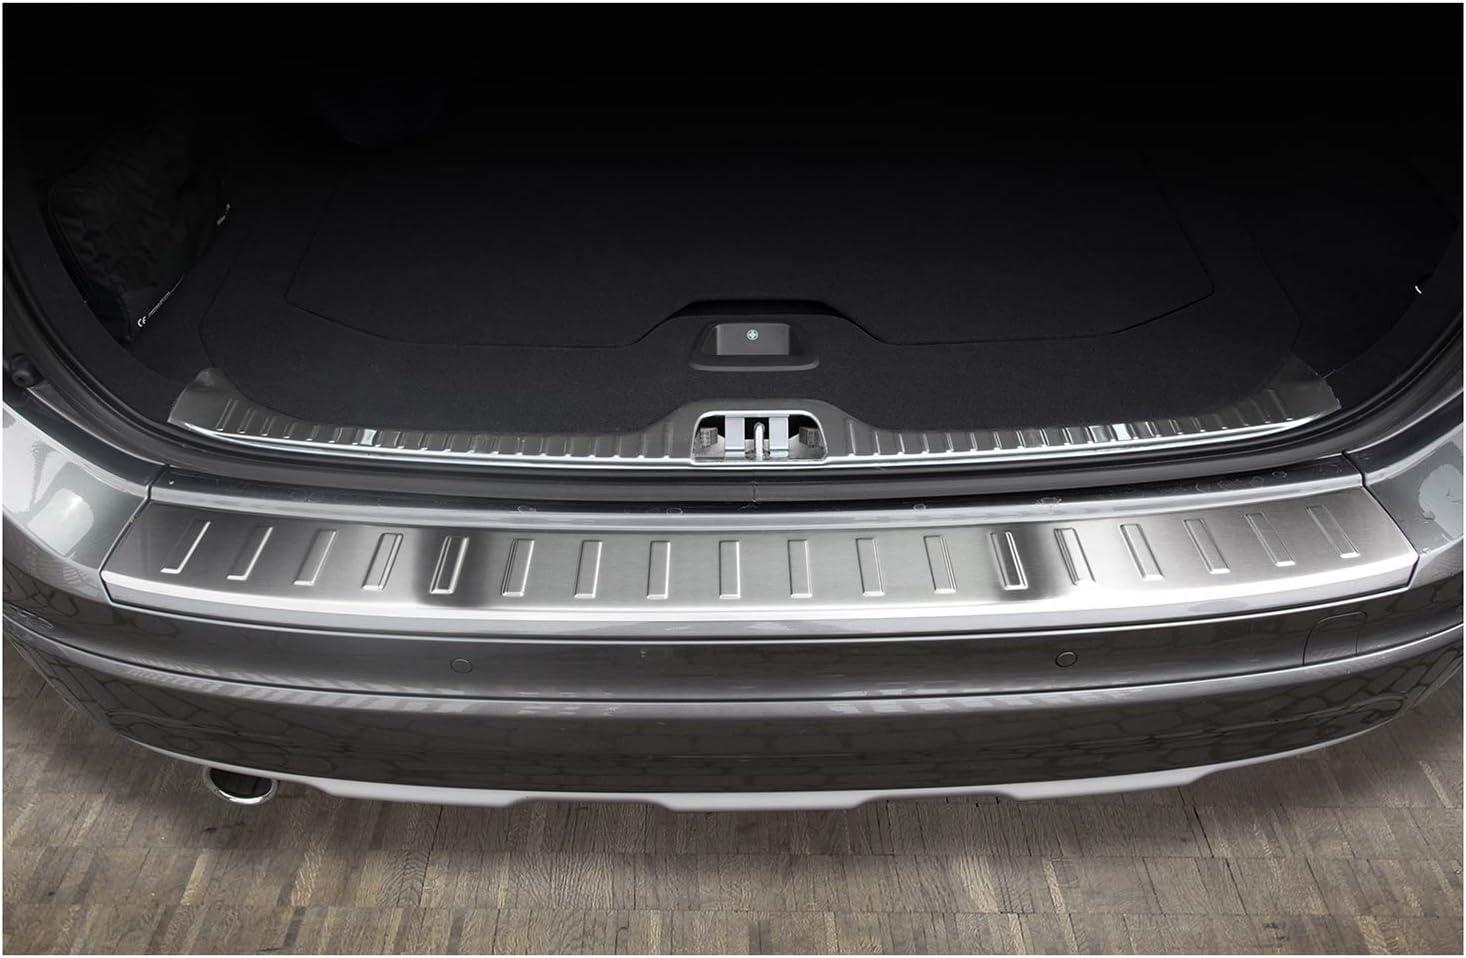 tuning-art BL921 Protector de Borde de Carga para Volvo XC60 2013-2017 con un Borde